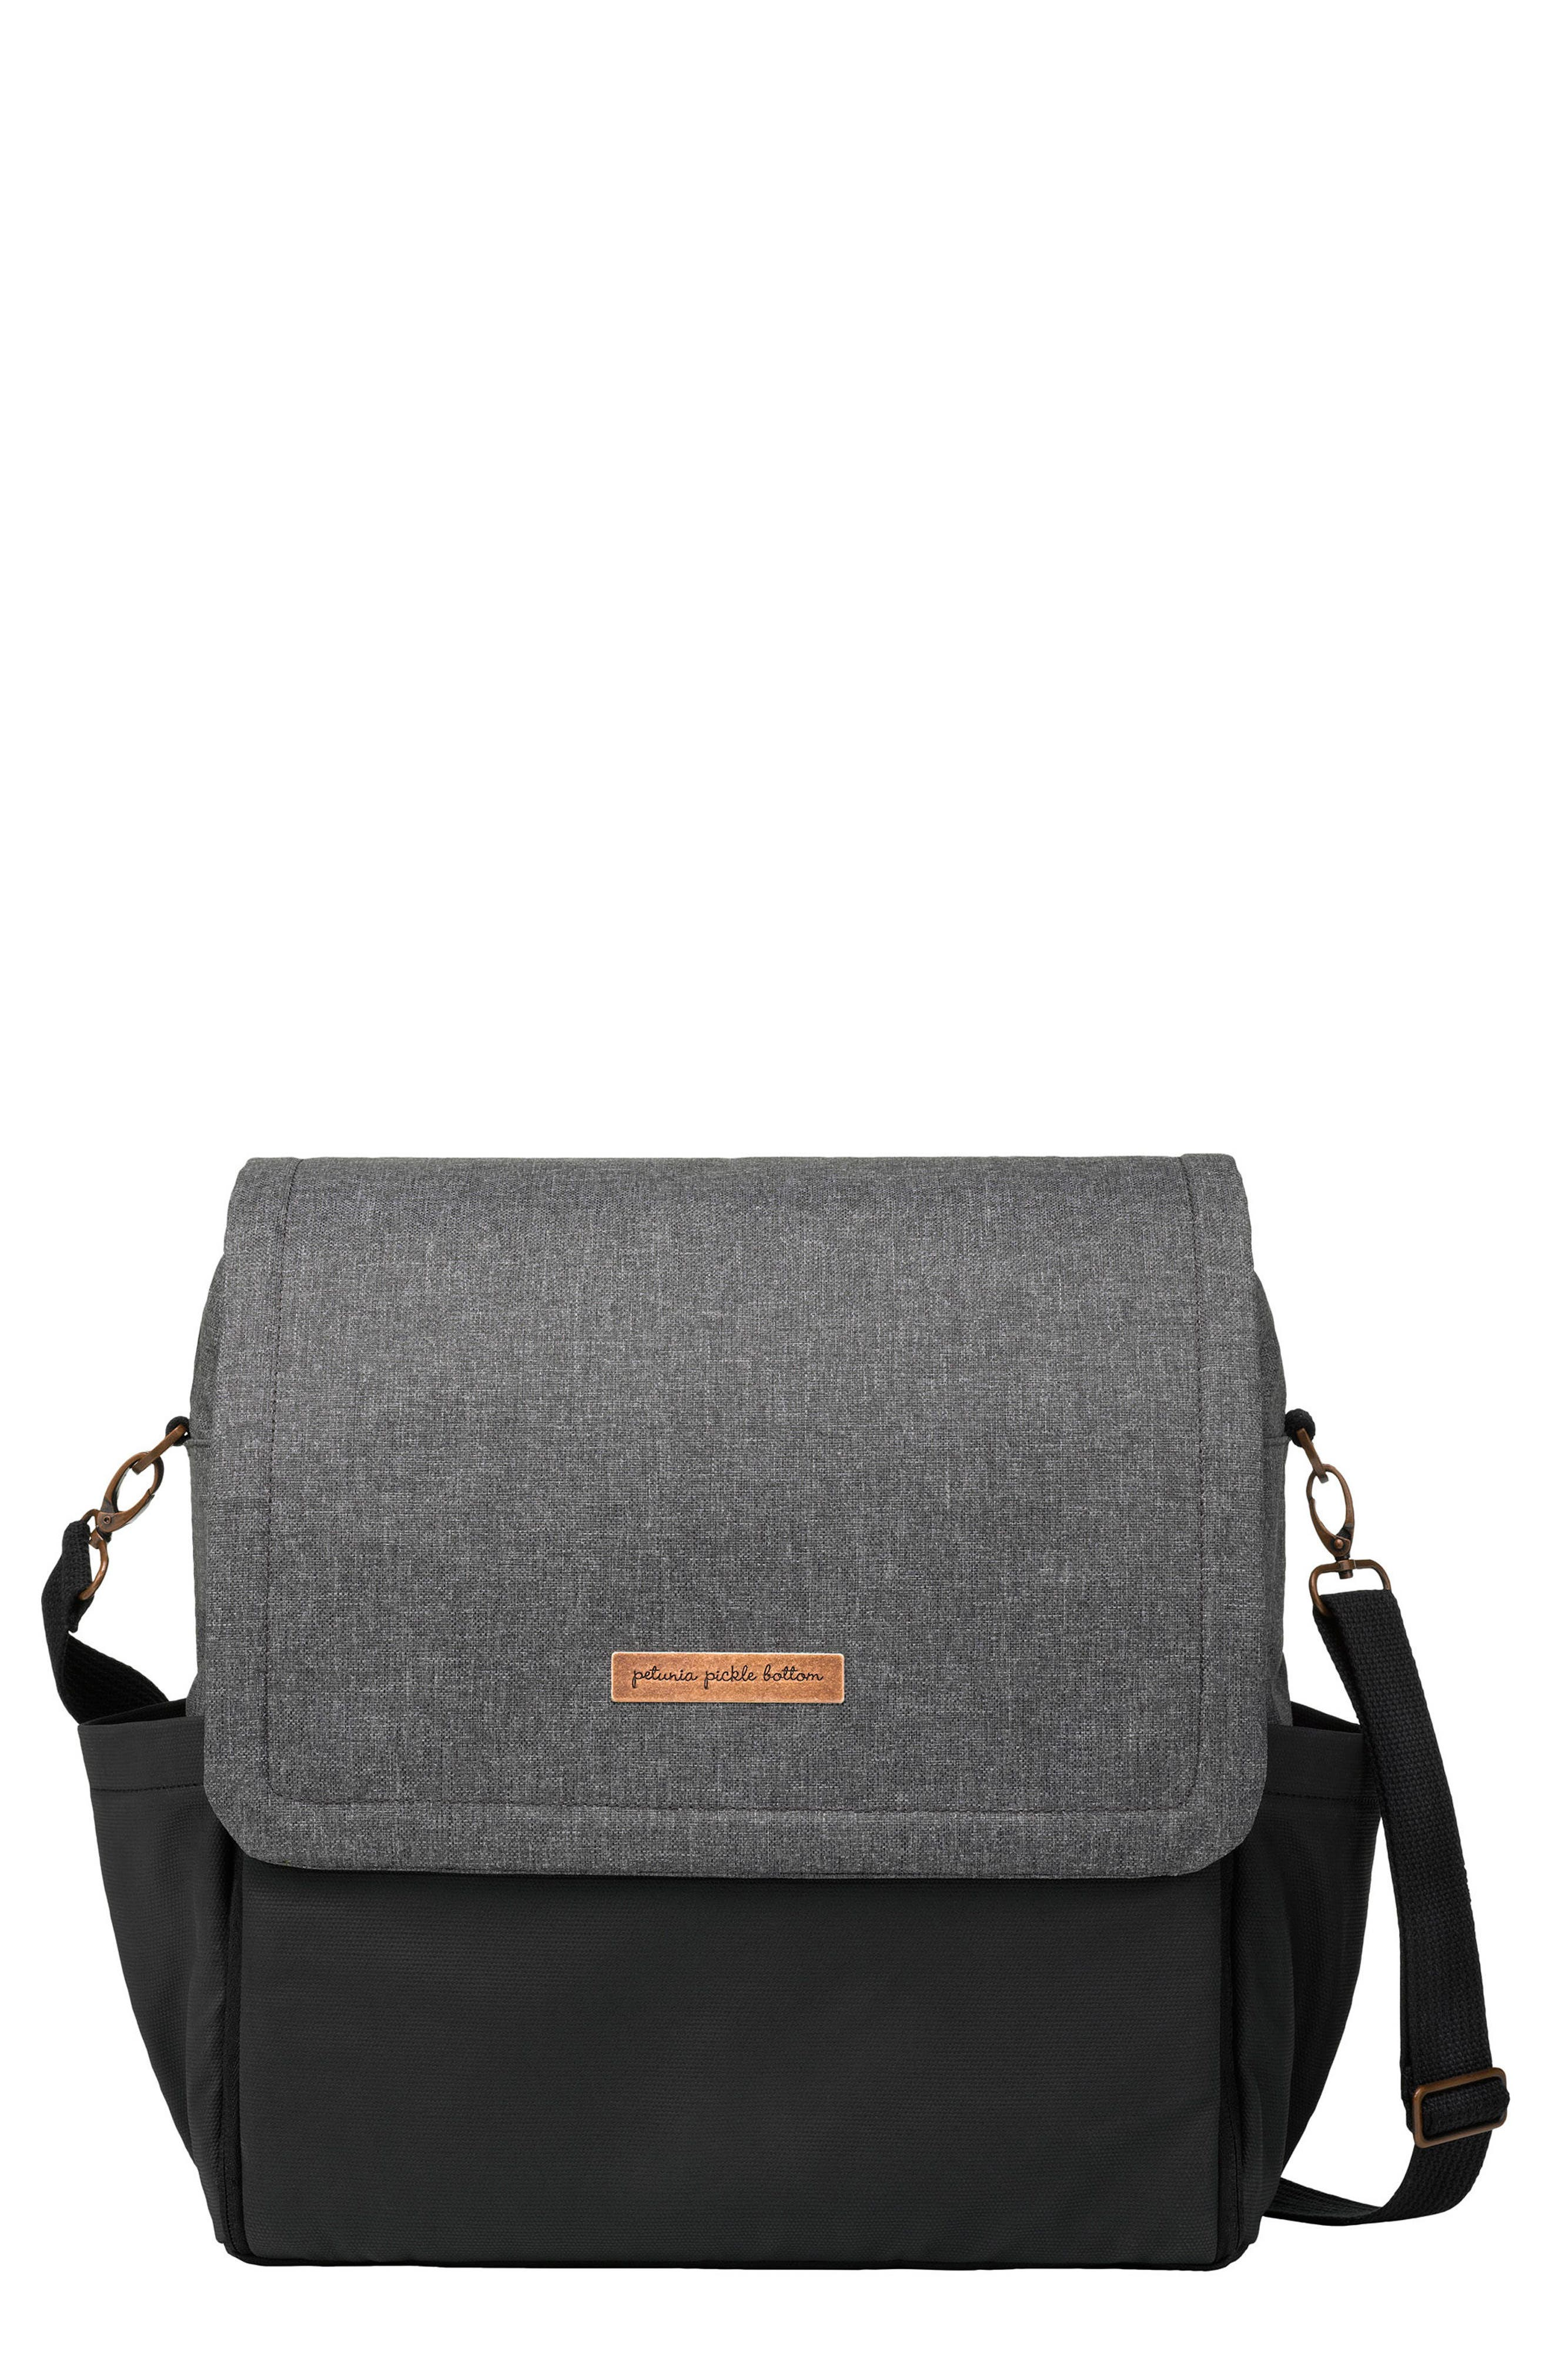 Boxy Backpack Diaper Bag,                         Main,                         color, GRAPHITE/ BLACK